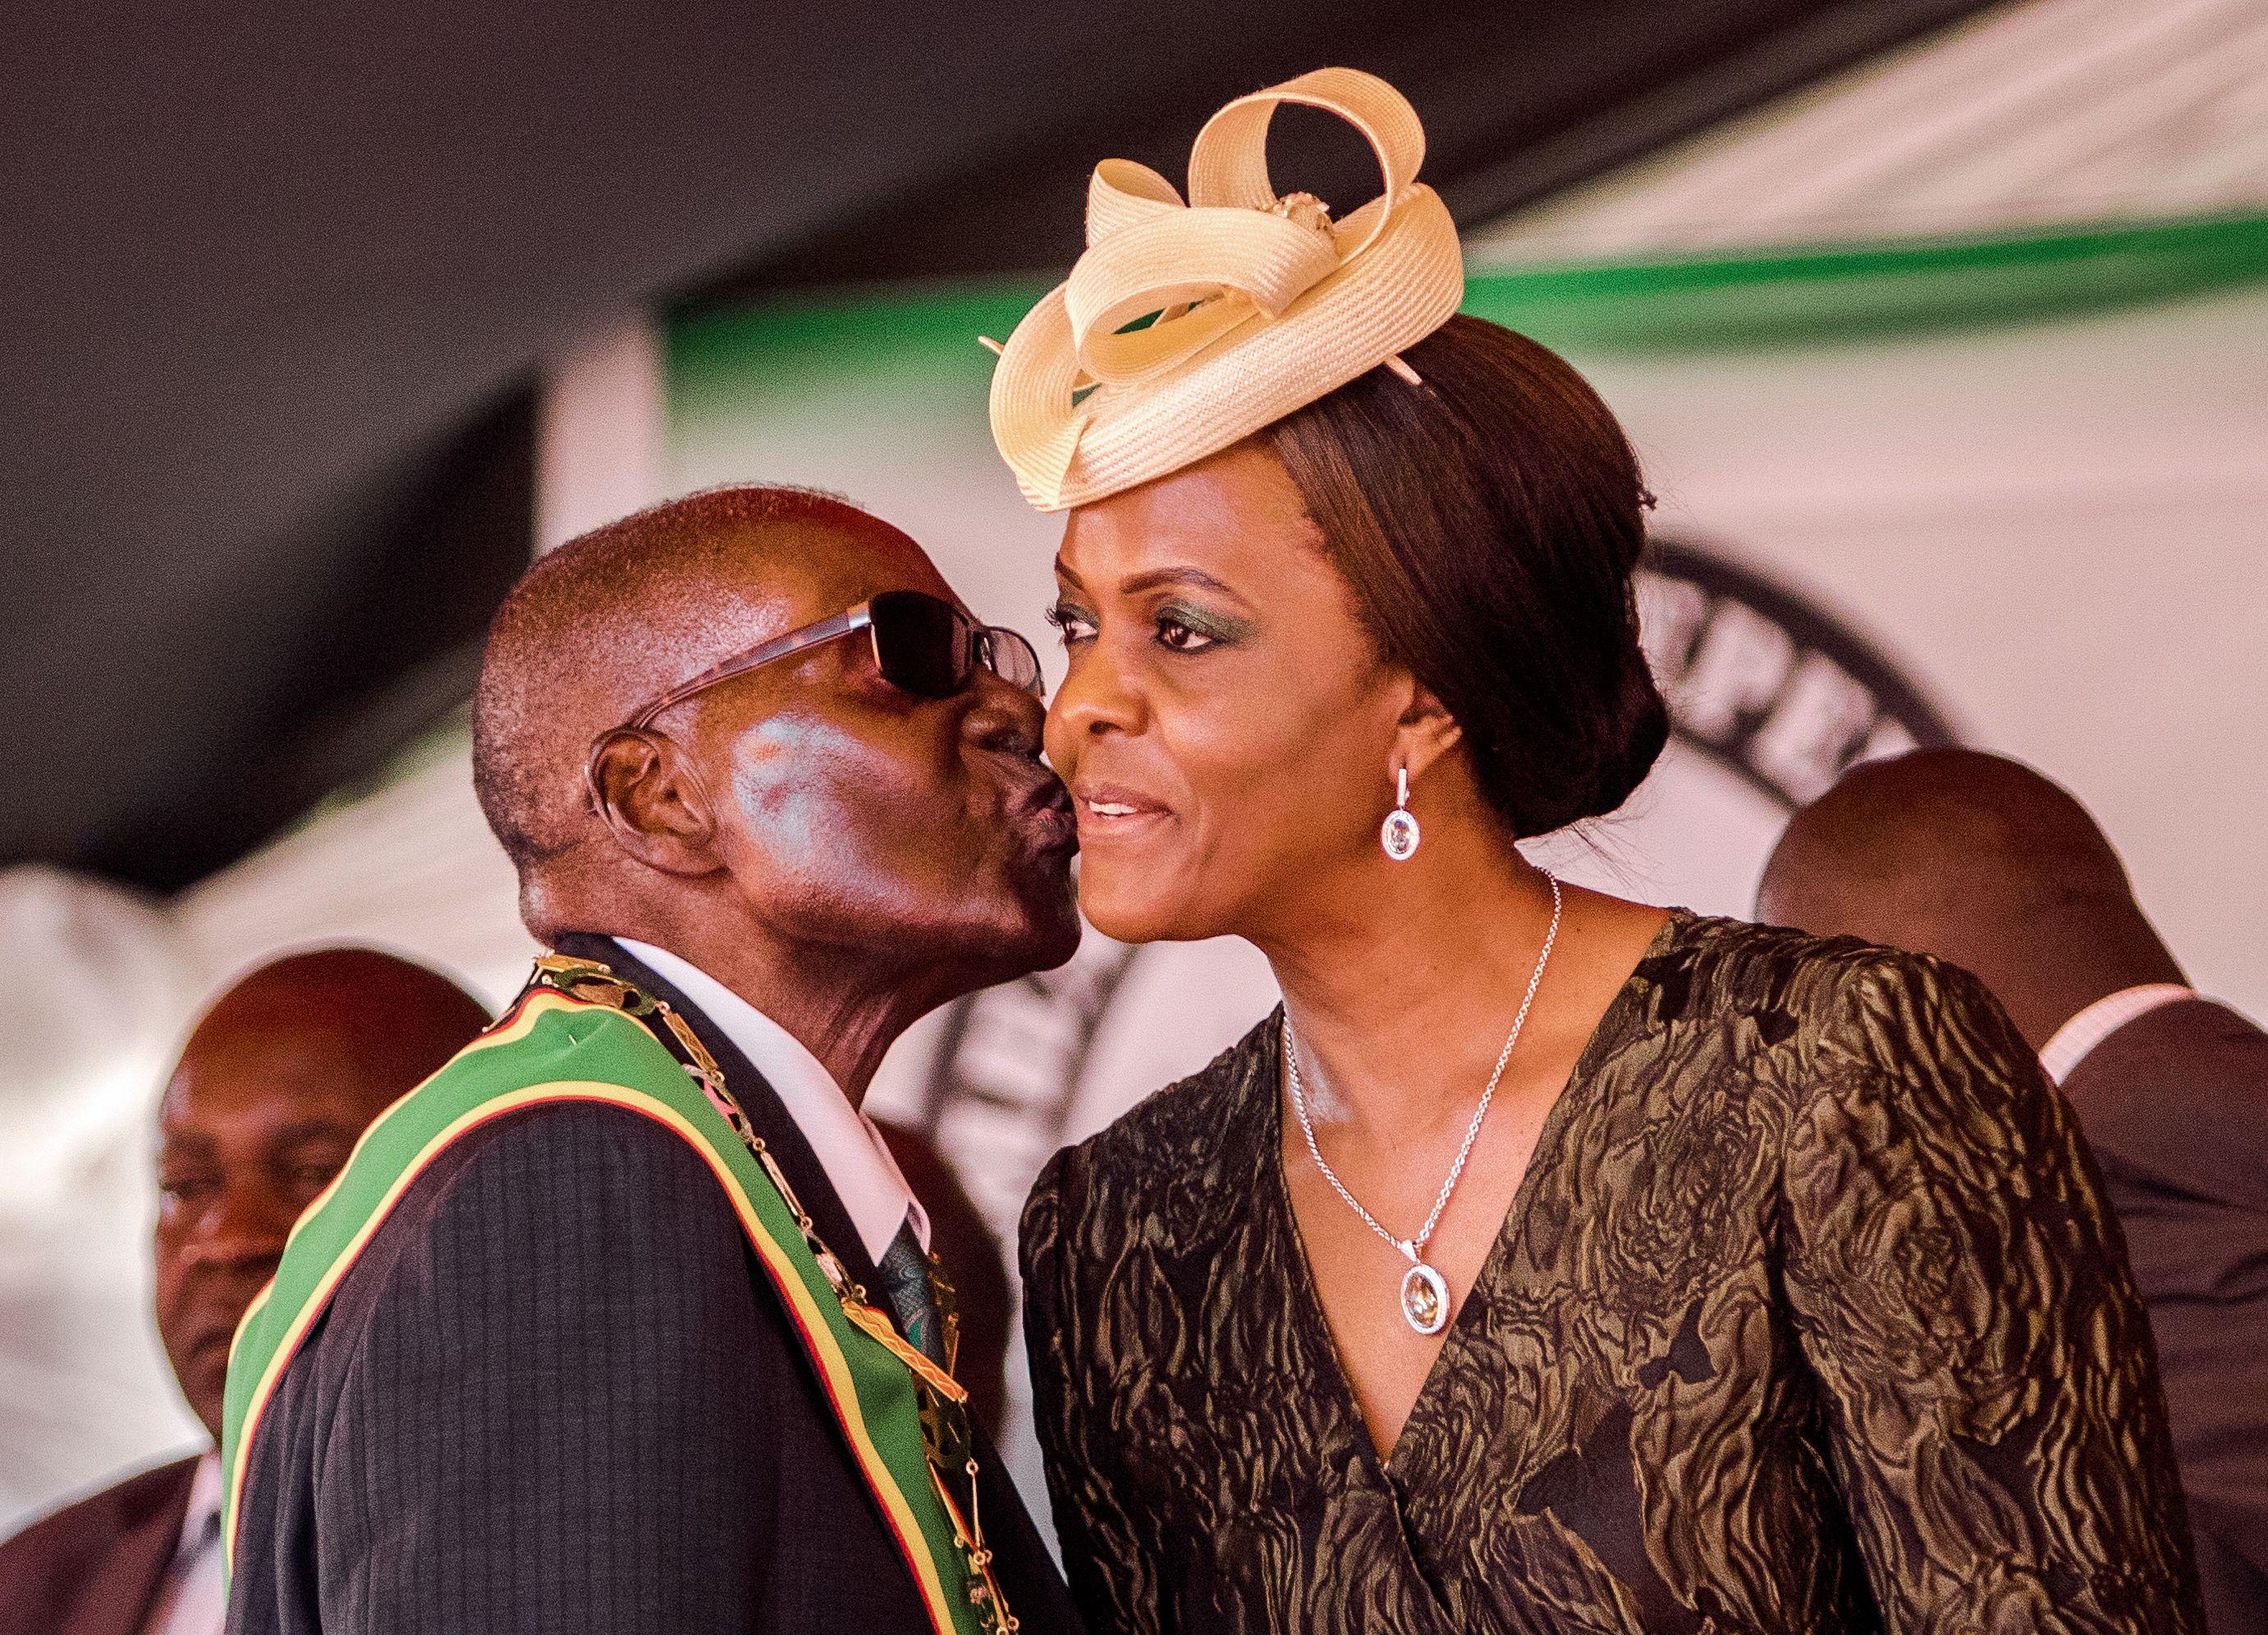 ZIMBABWE-POLITICS-PARTY